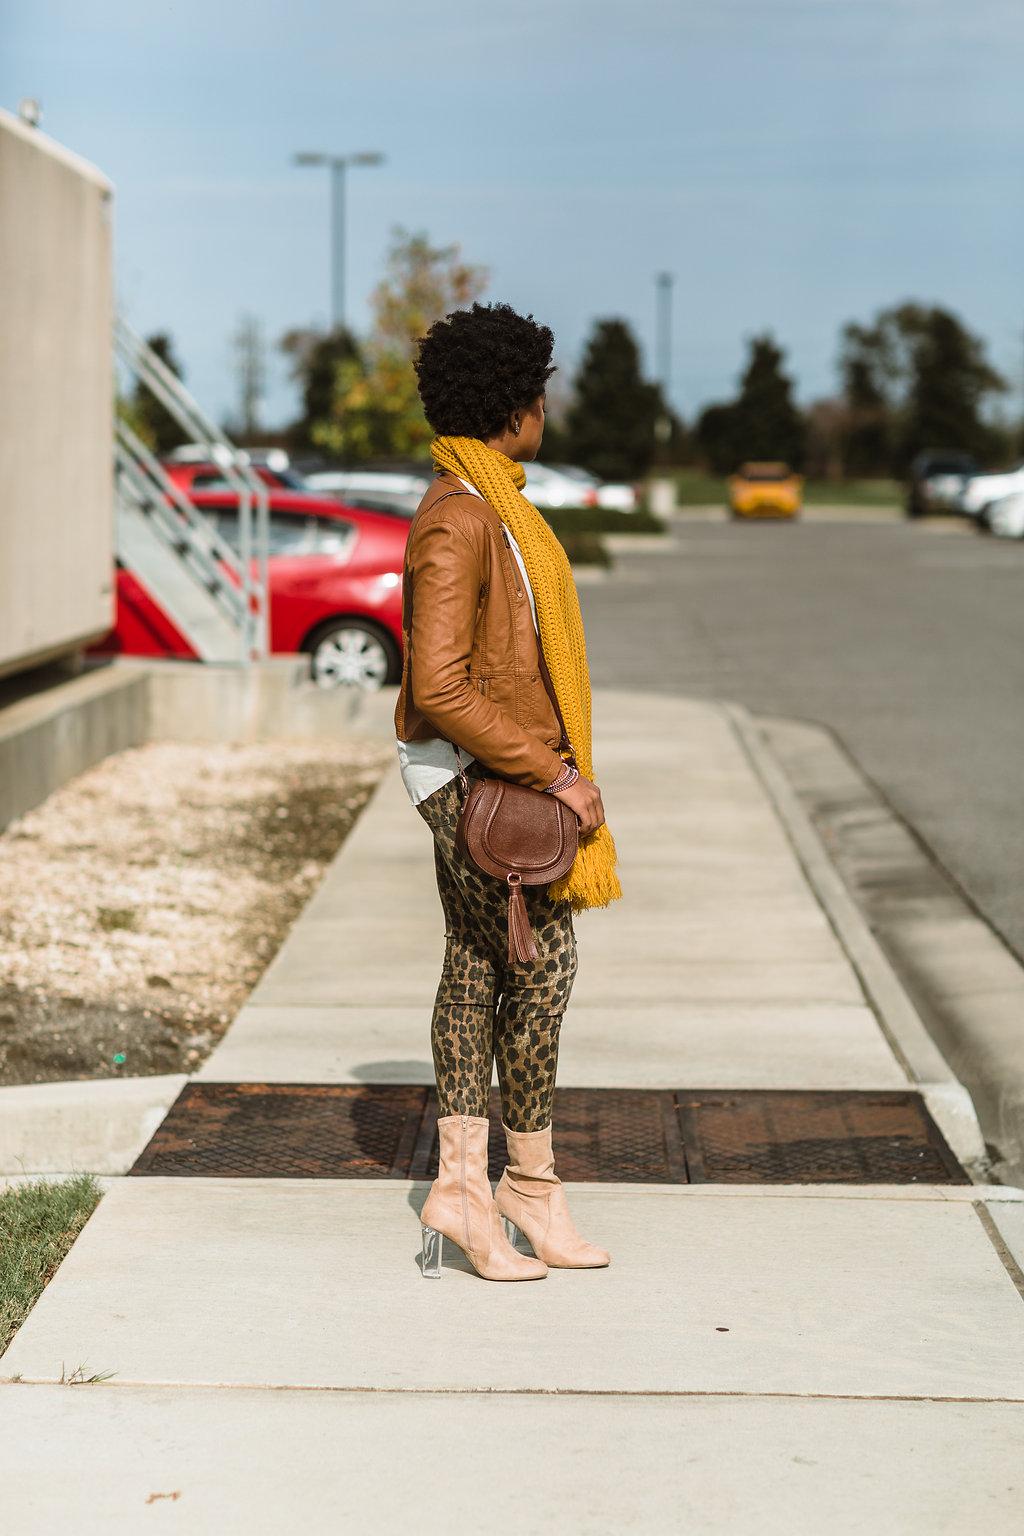 louisiana fashion blogger, the beauty beau